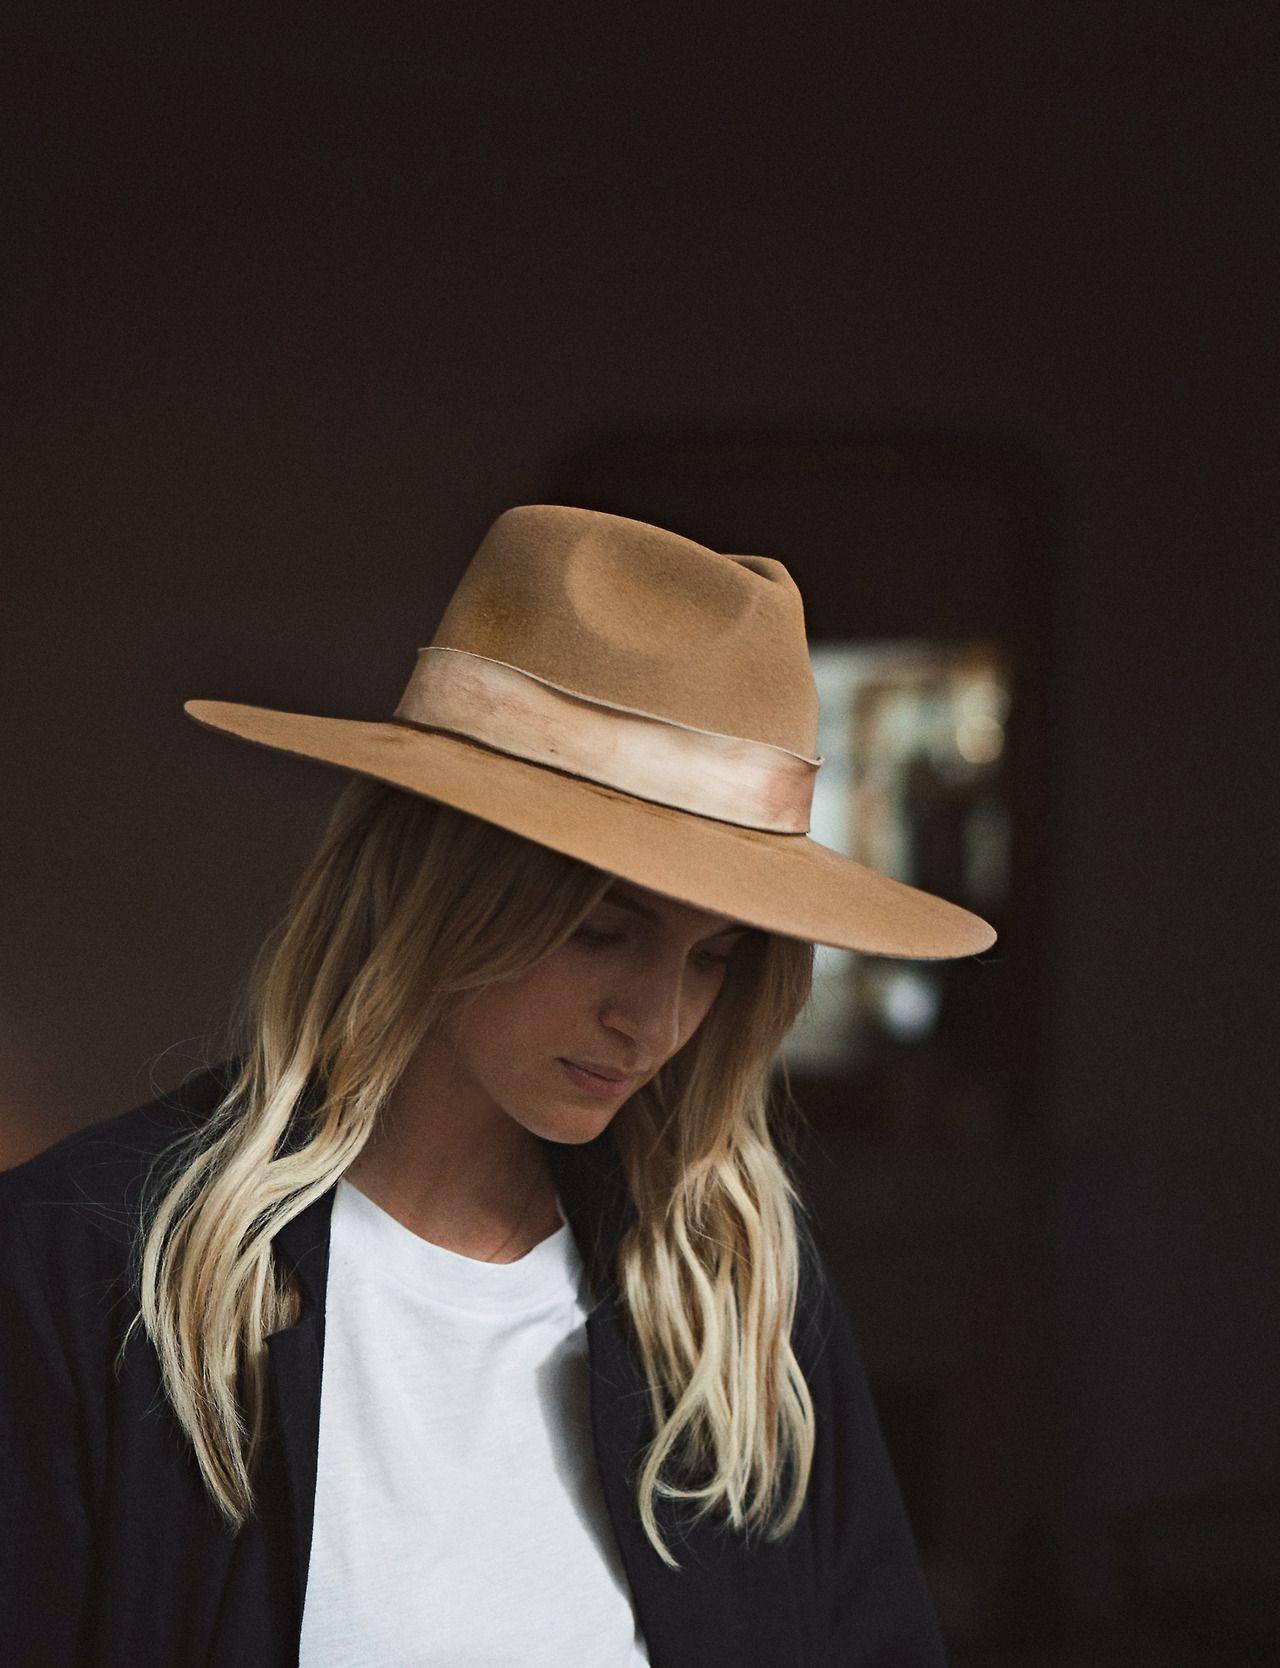 ee14e1a82cae3 jambo melanie Cool Hats